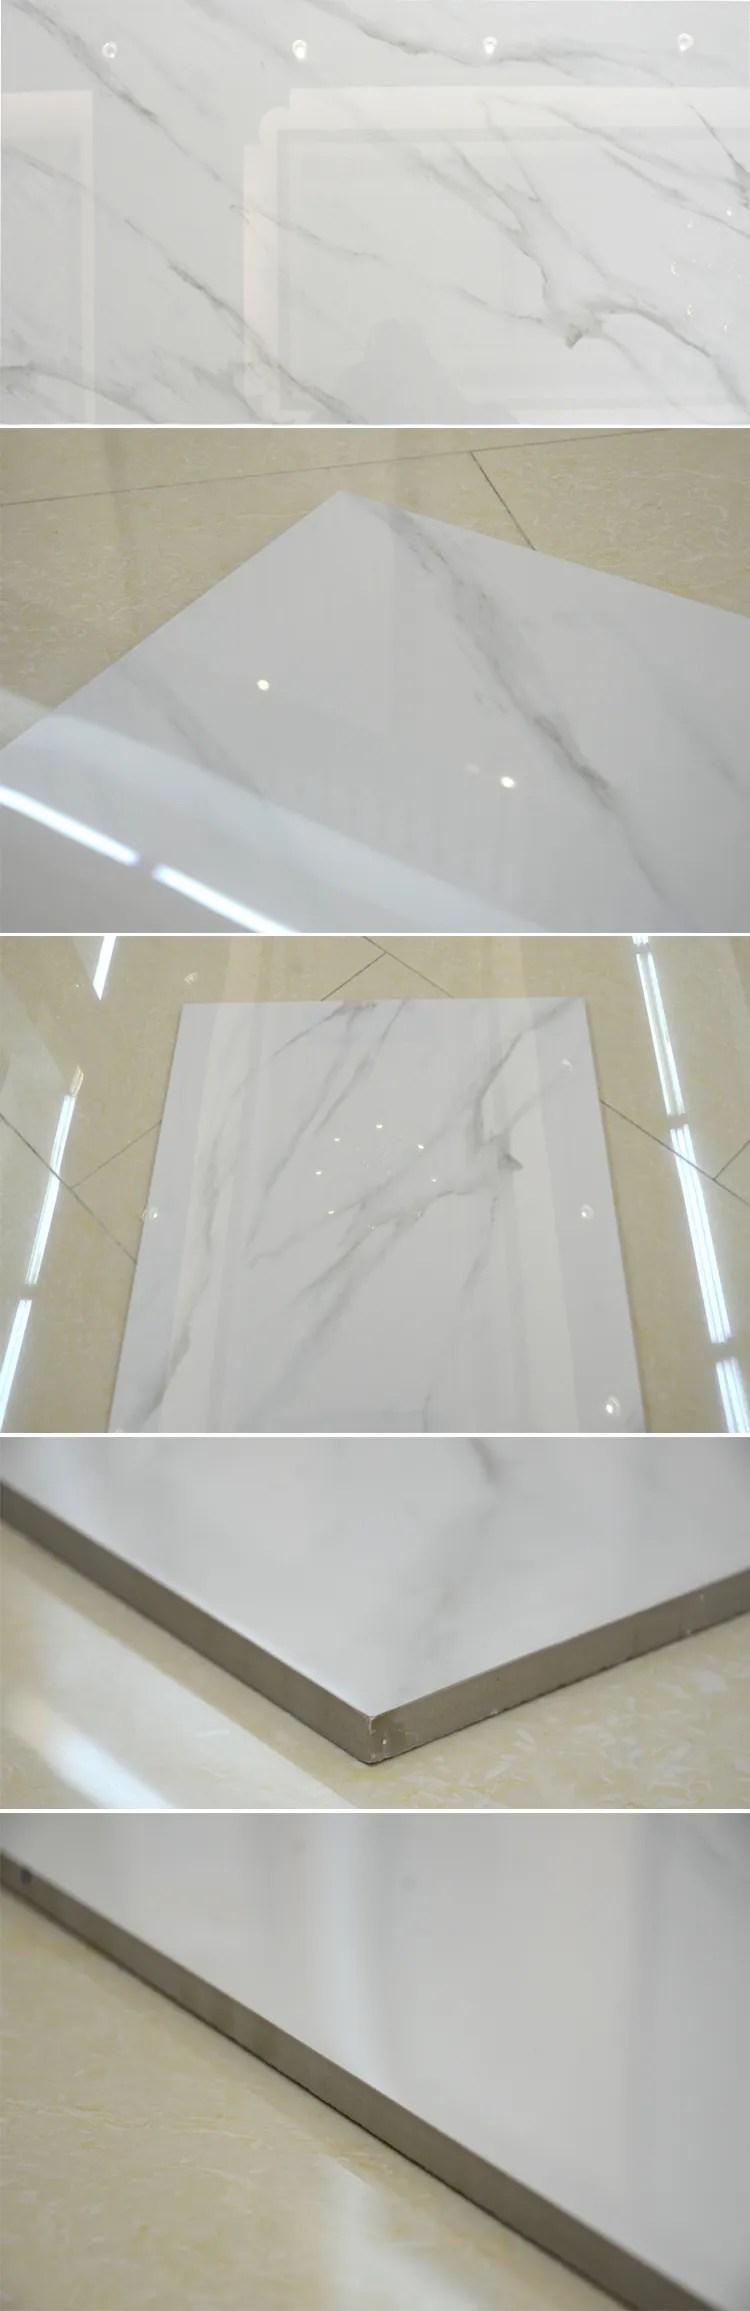 neo home porcelain 6x12 porcelanto marble floor tiles for bathrooms buy porcelain marble lowes floor tiles for bathrooms home tiles product on